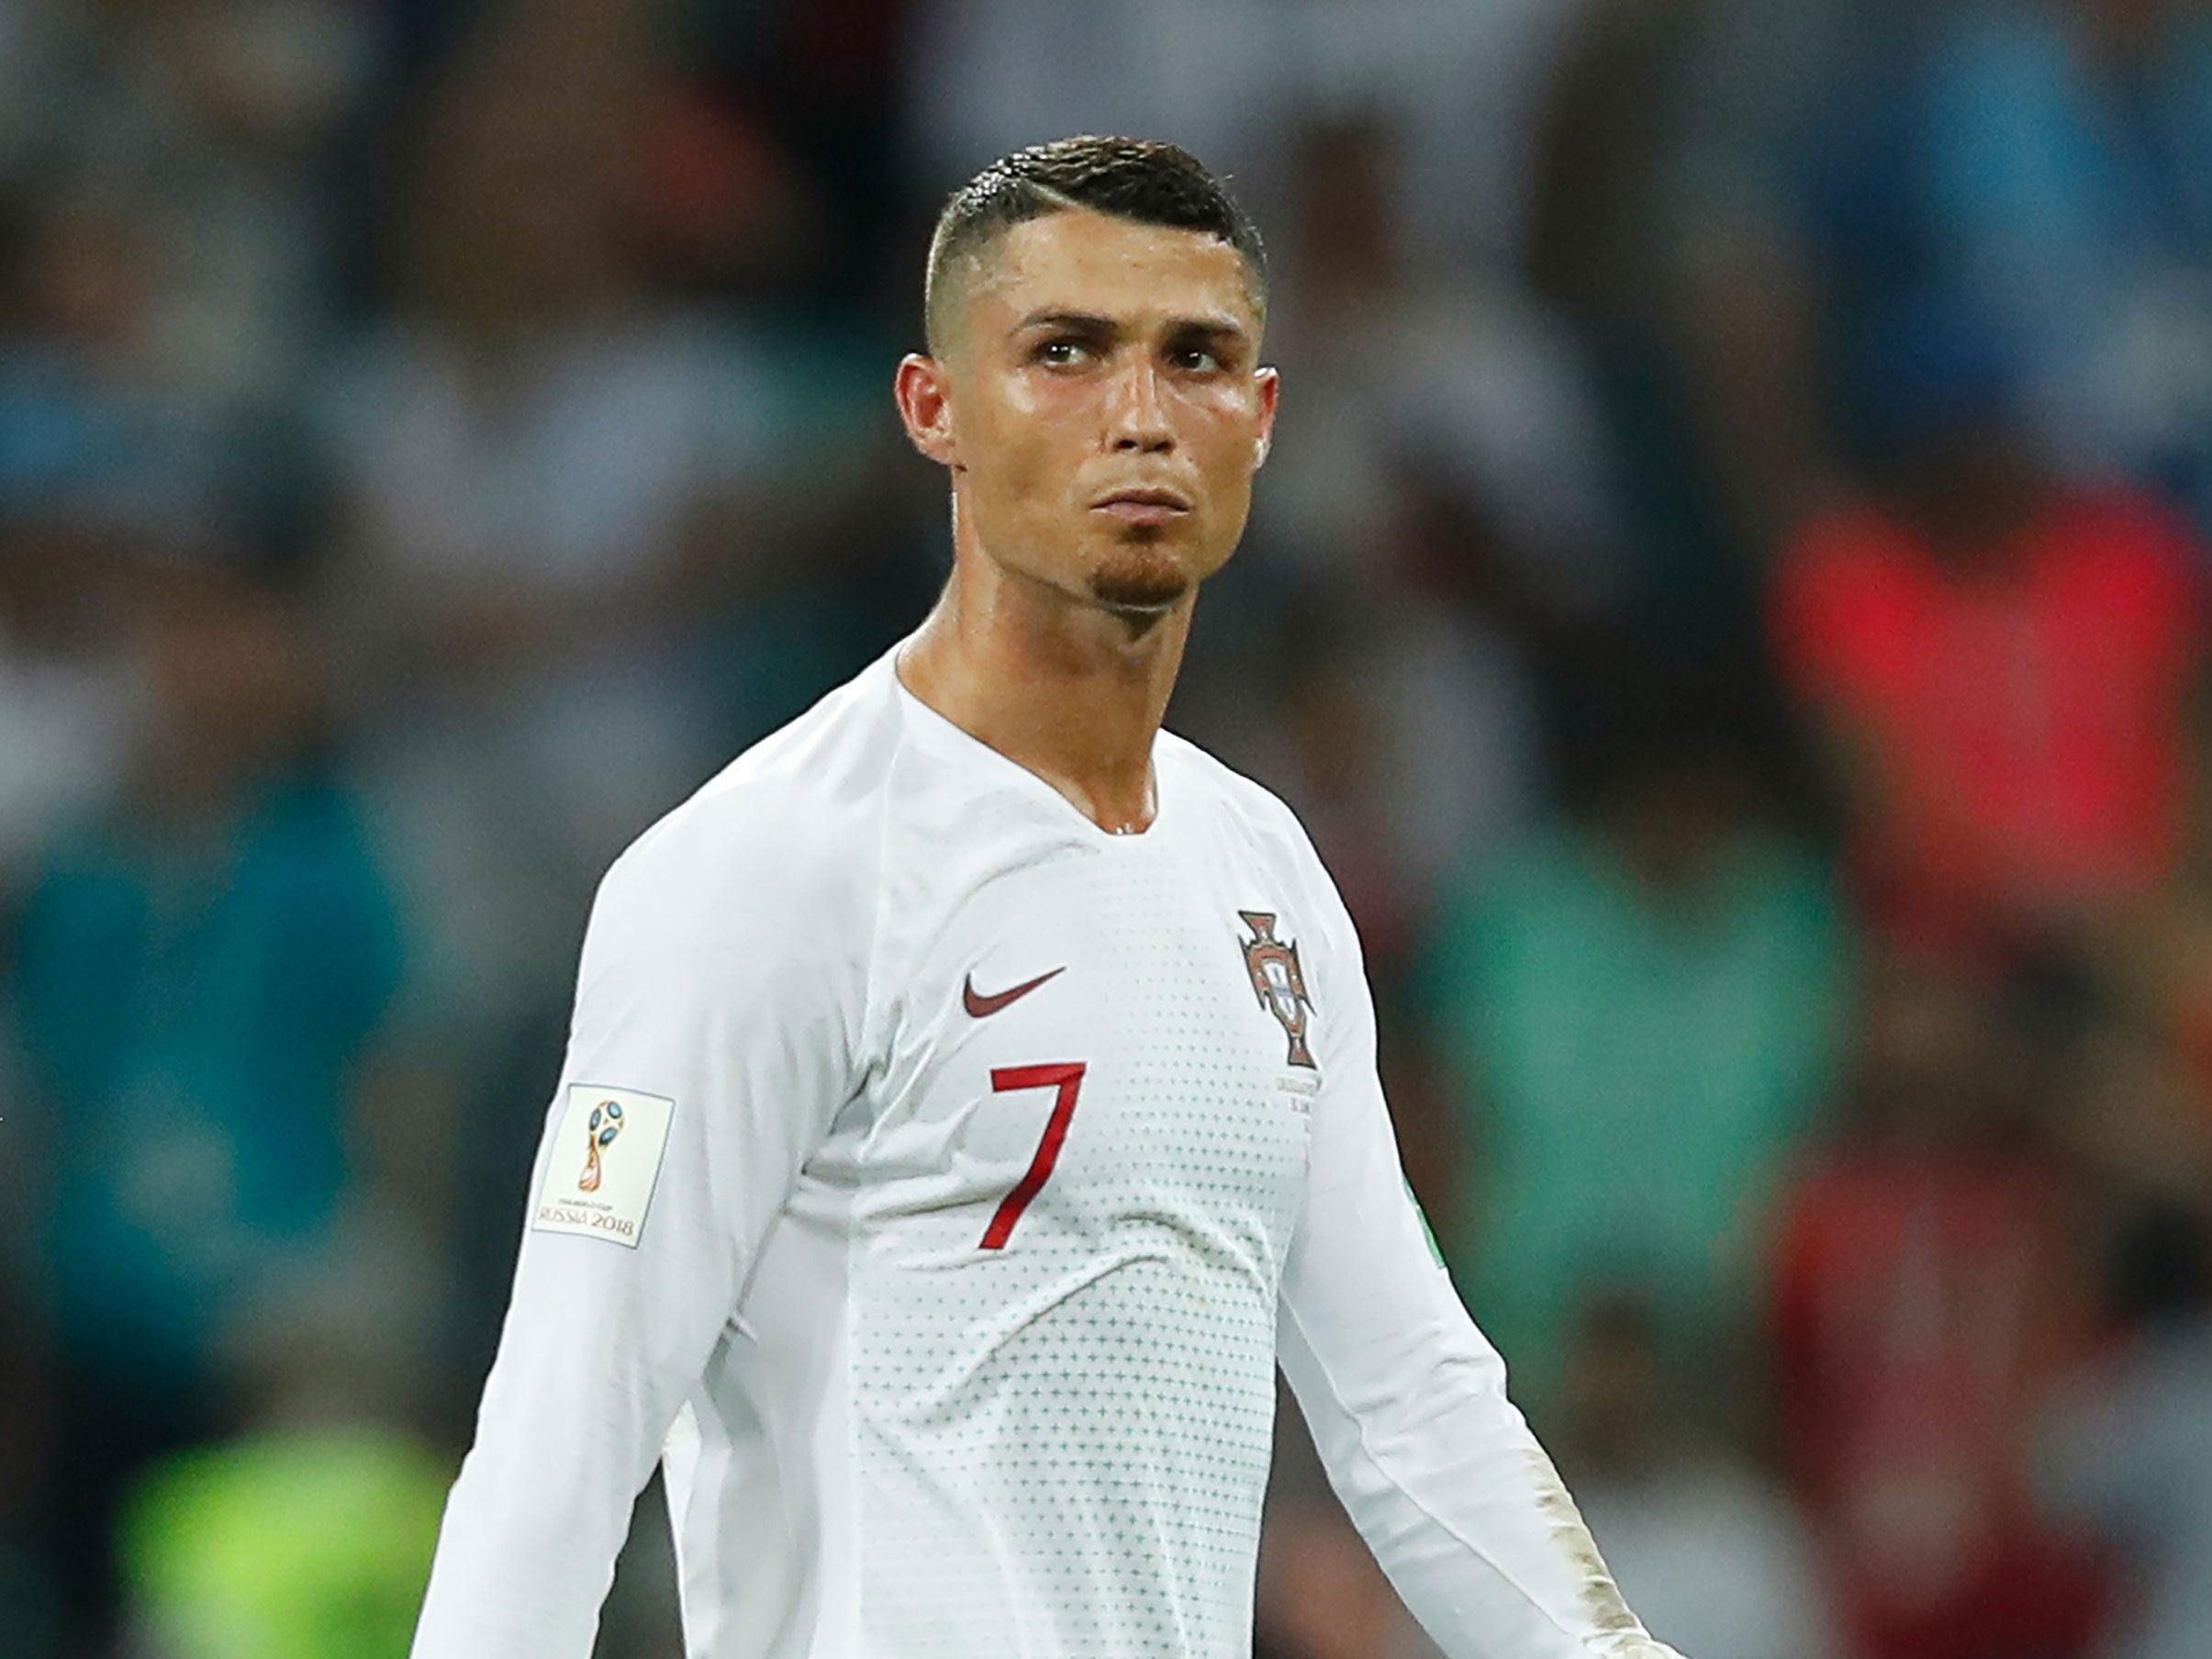 World Cup 2018: Cristiano Ronaldo still has much to give Portugal despite exit, insists Fernando Santos